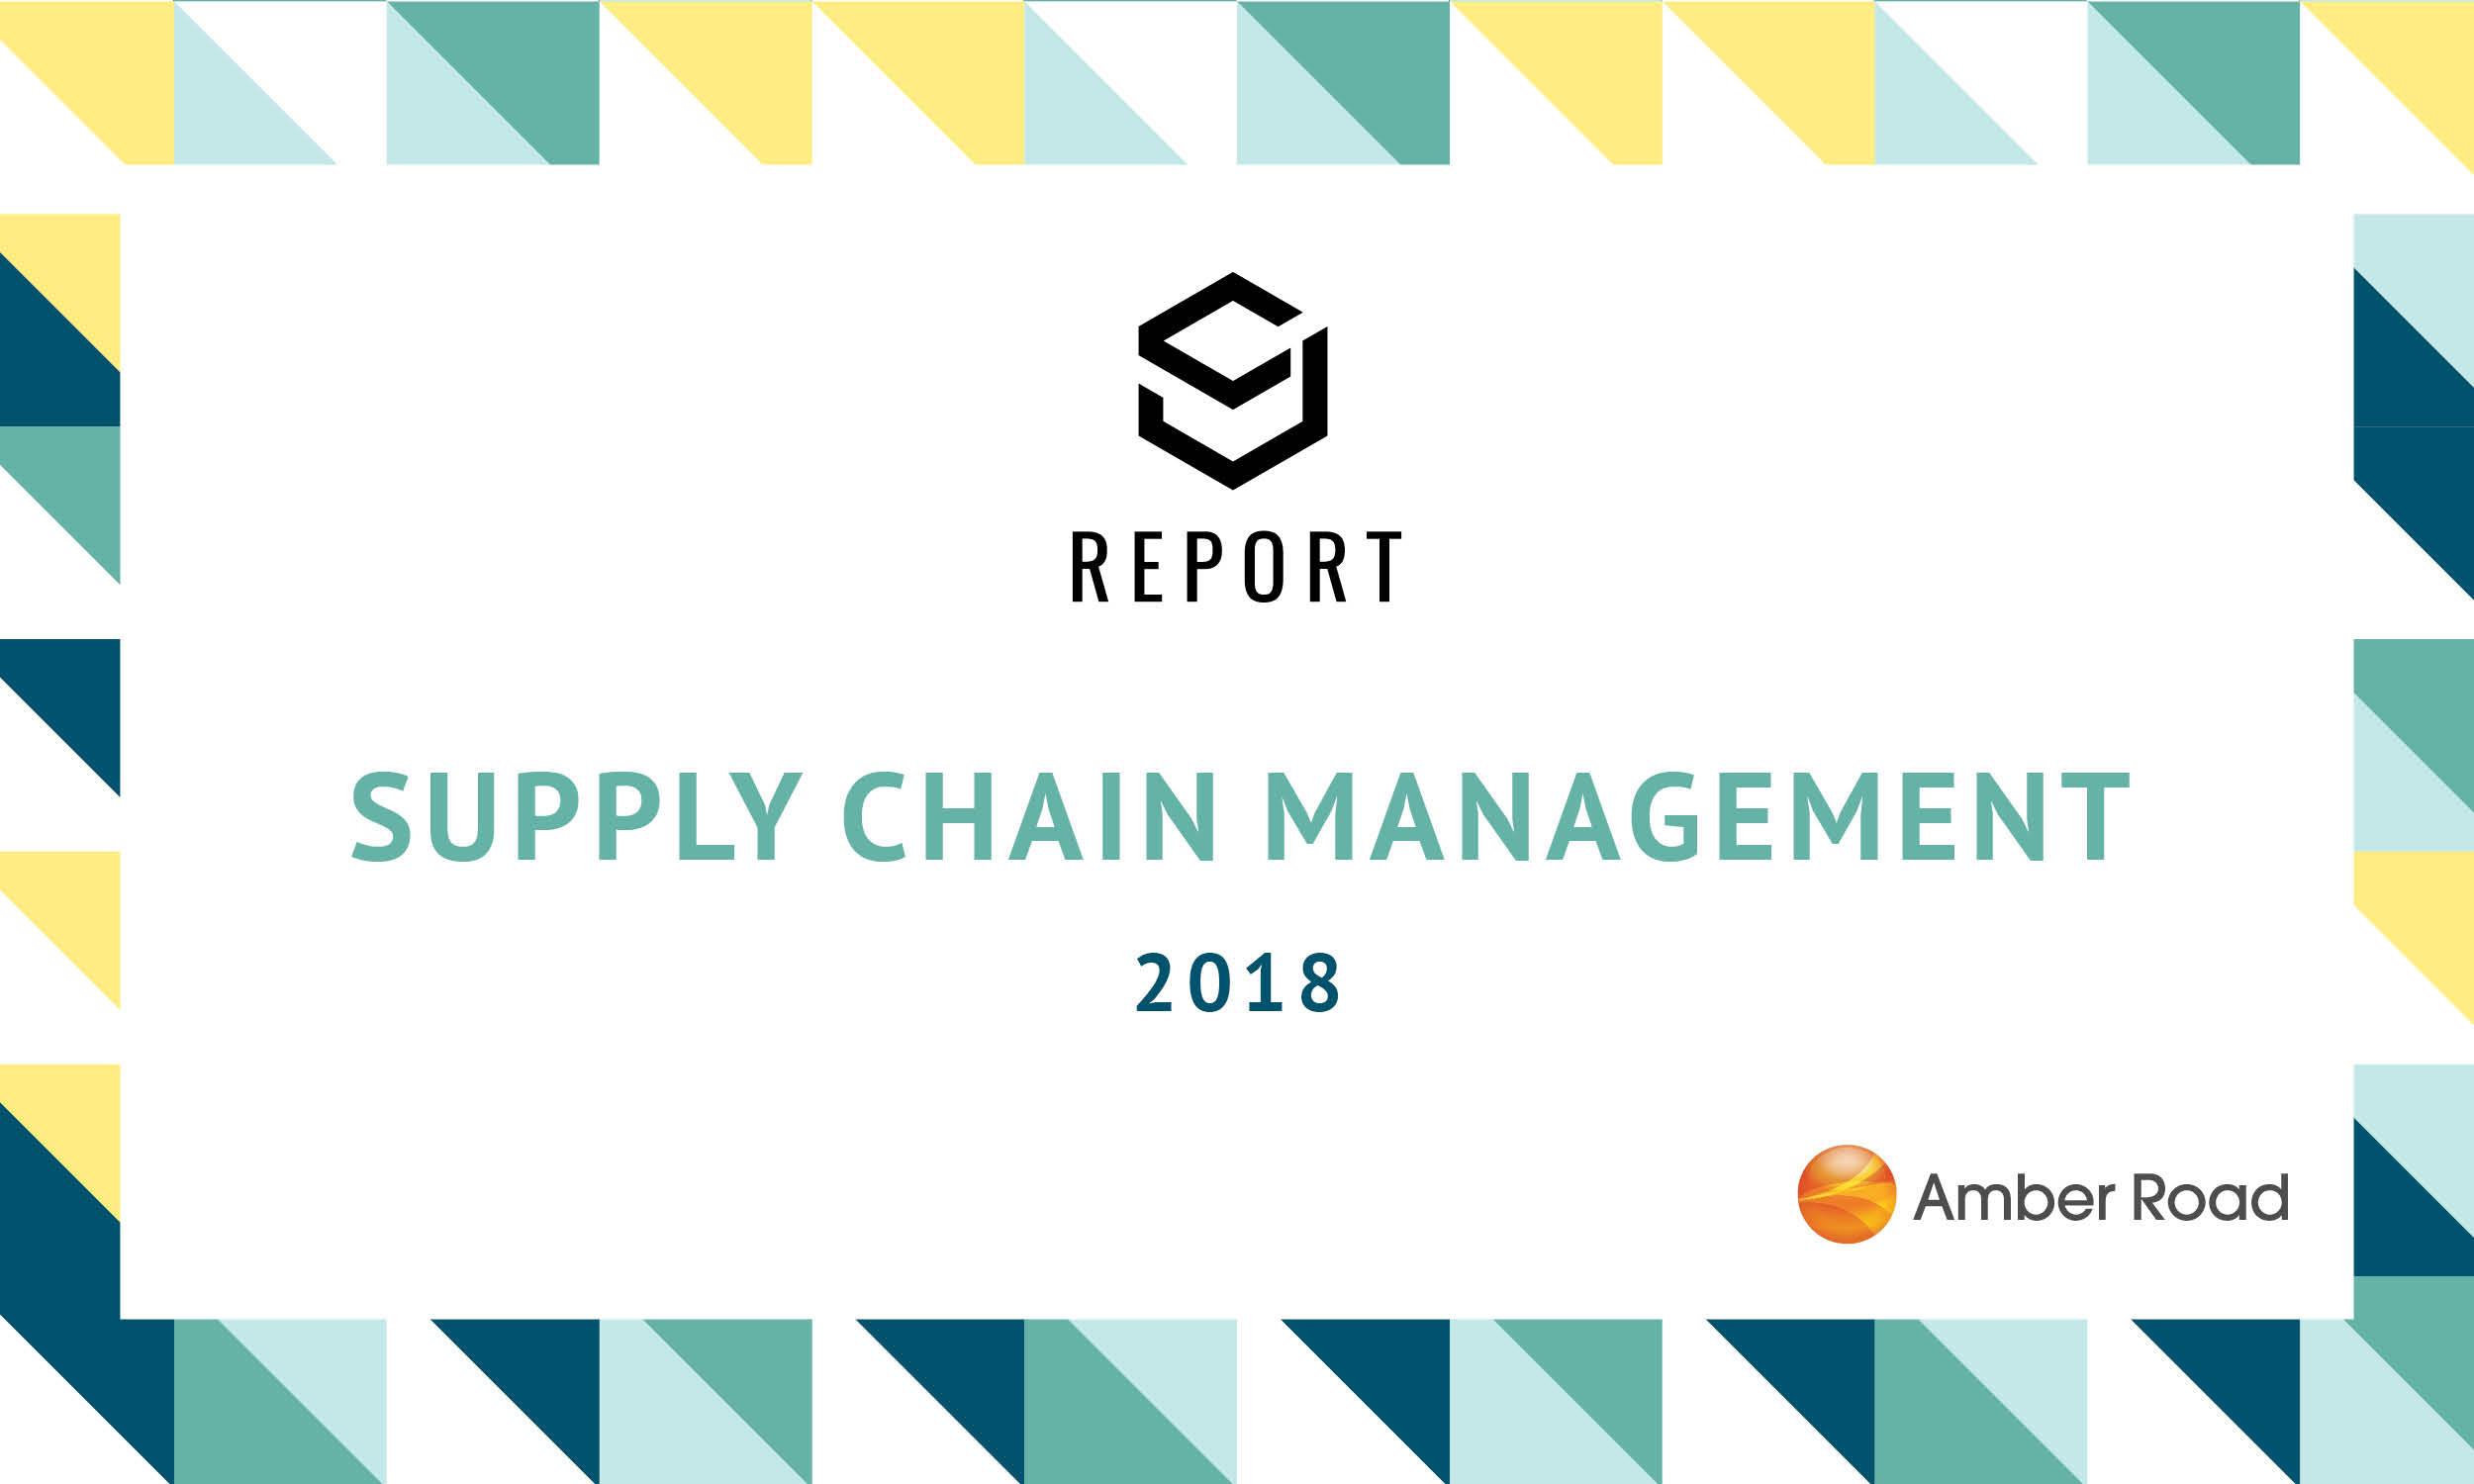 SJ Report: Supply Chain Management